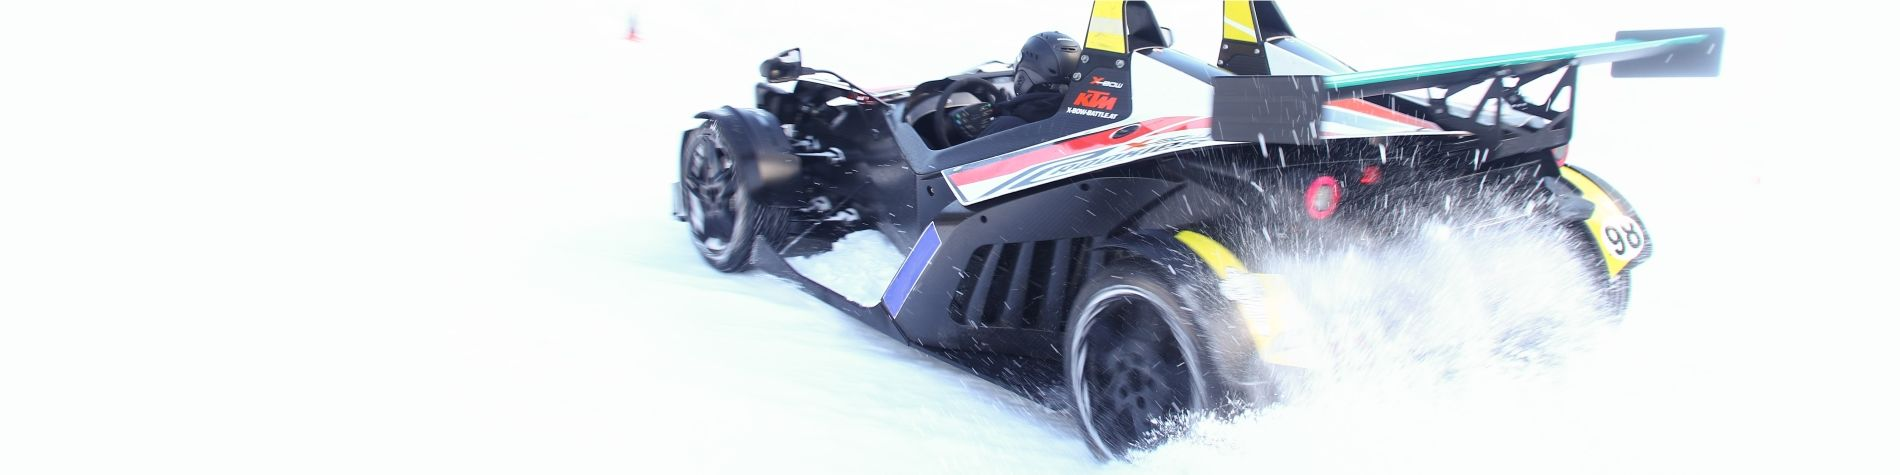 KTM X-Bow Schnee & Eis